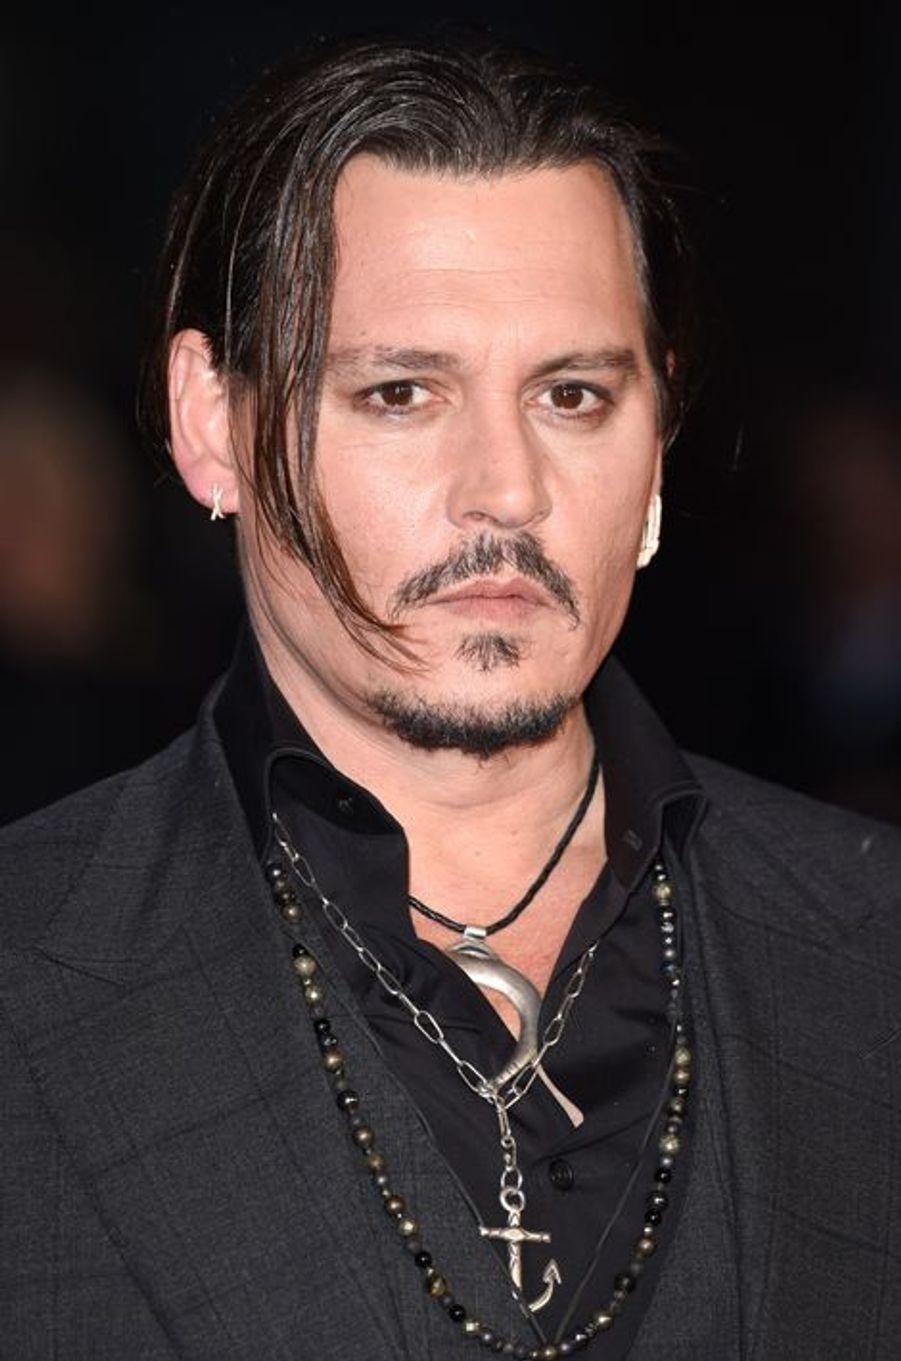 Johnny Depp à Londres le 11 octobre 2015